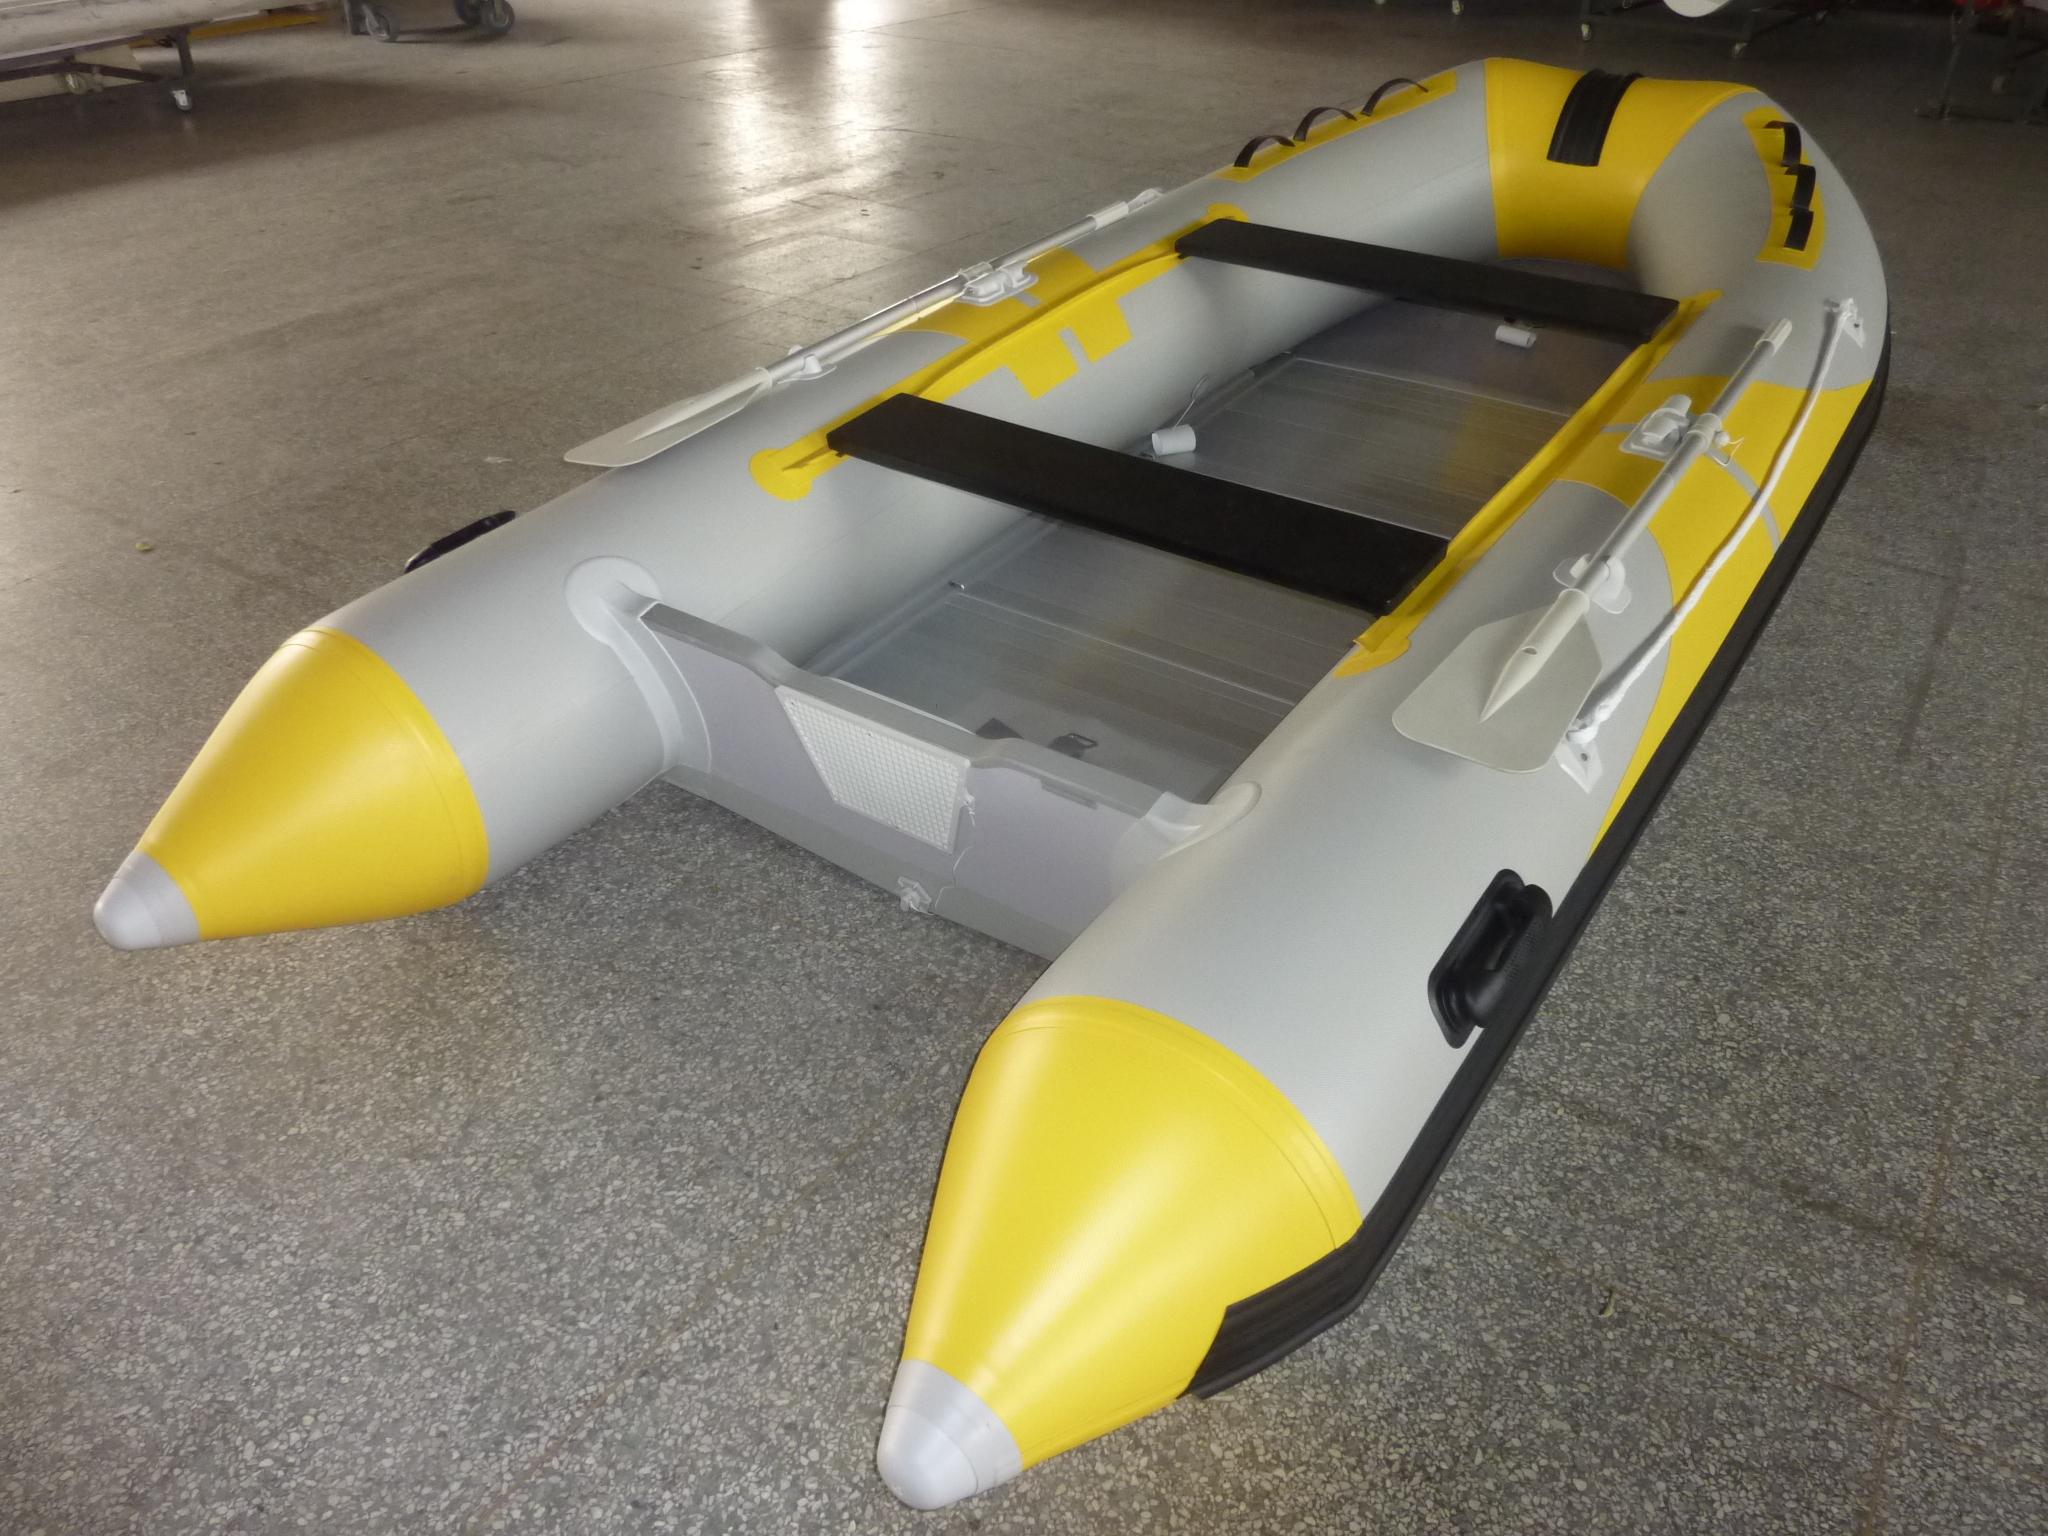 430V Inflatable Rubber Boat